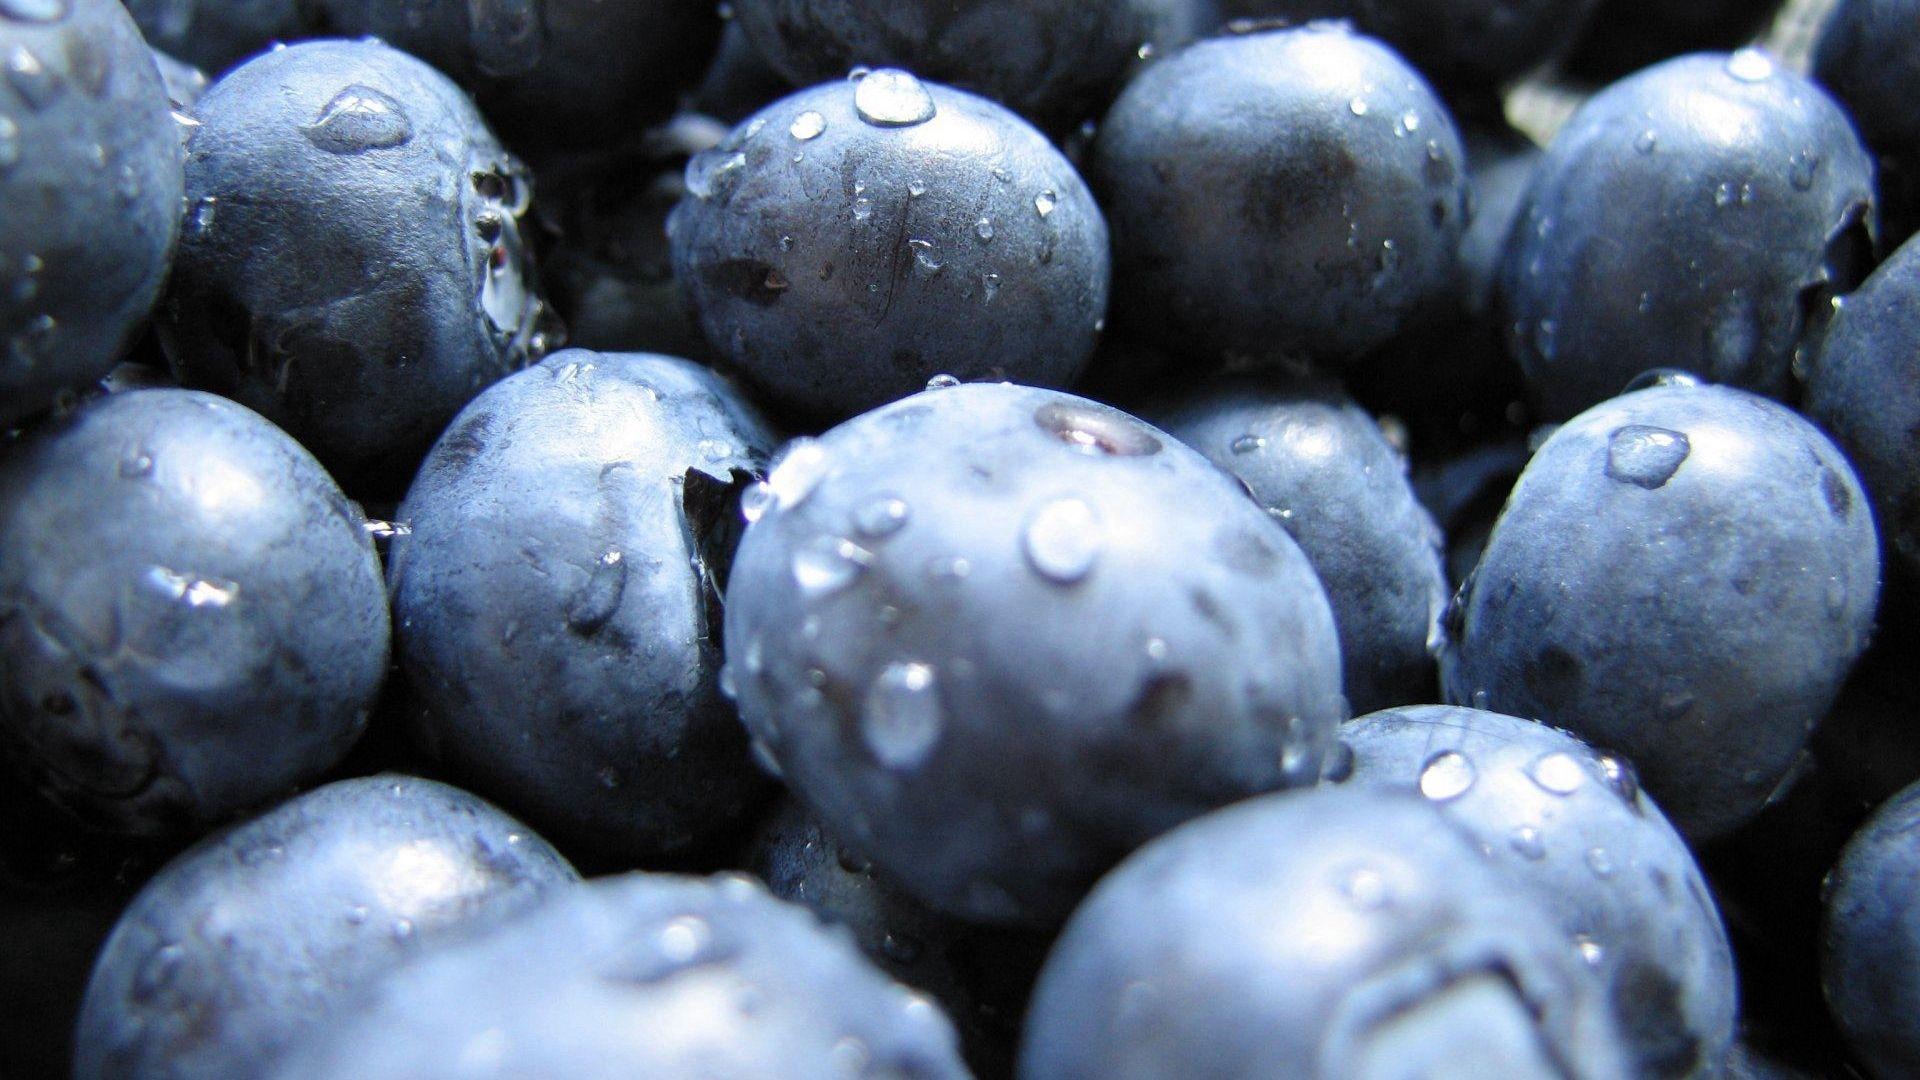 Blueberries wallpaper photo hd